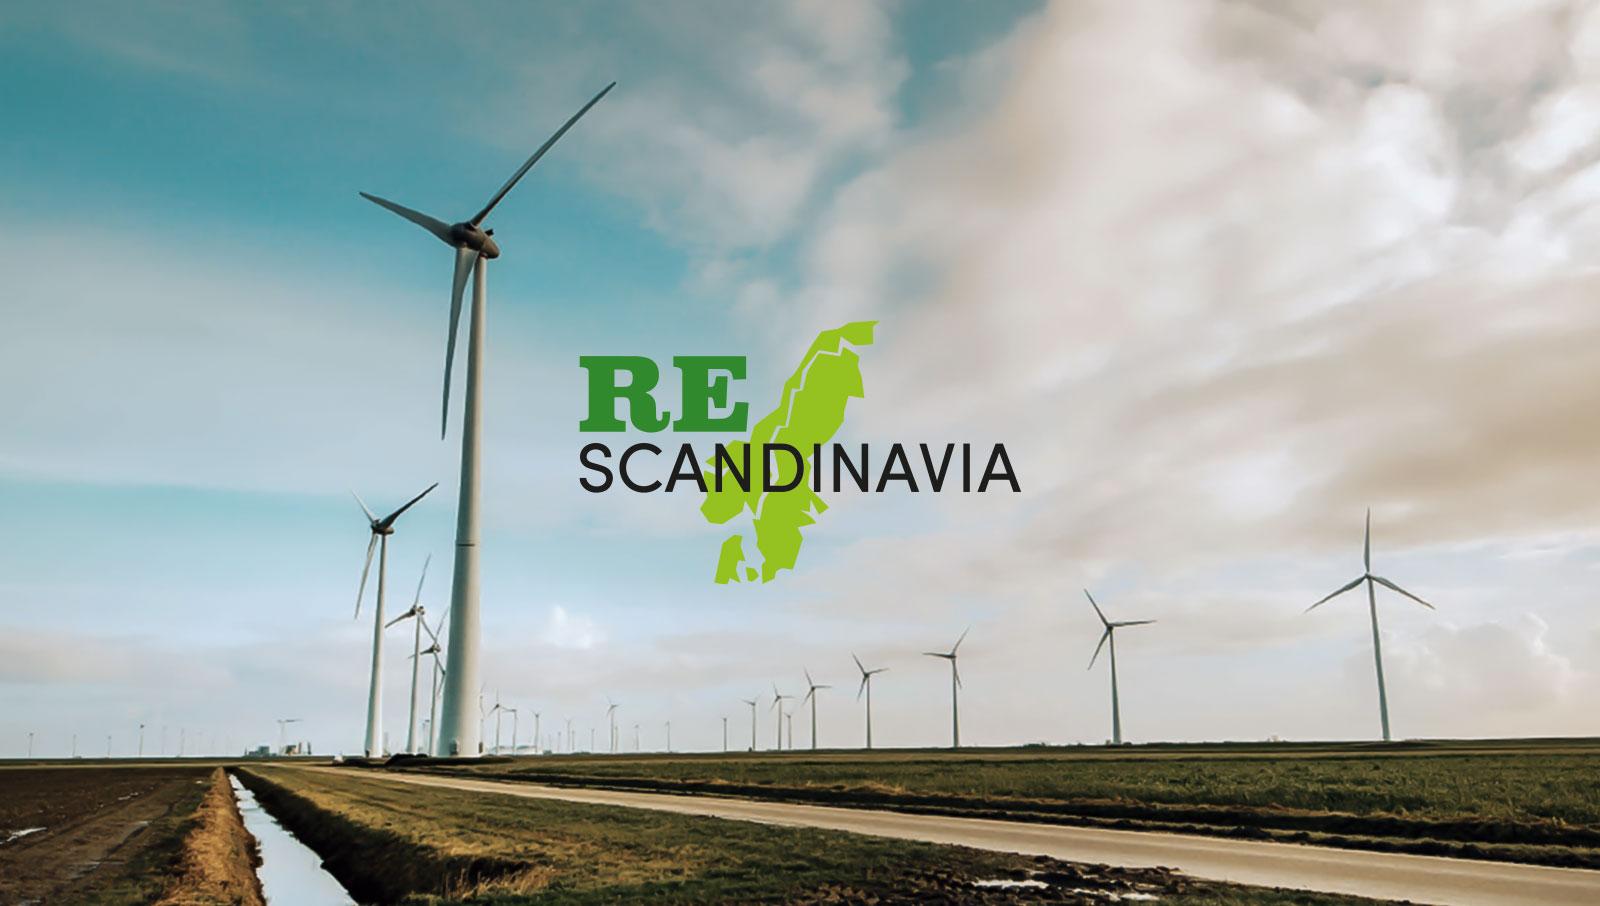 RE-Scandinavia 2021